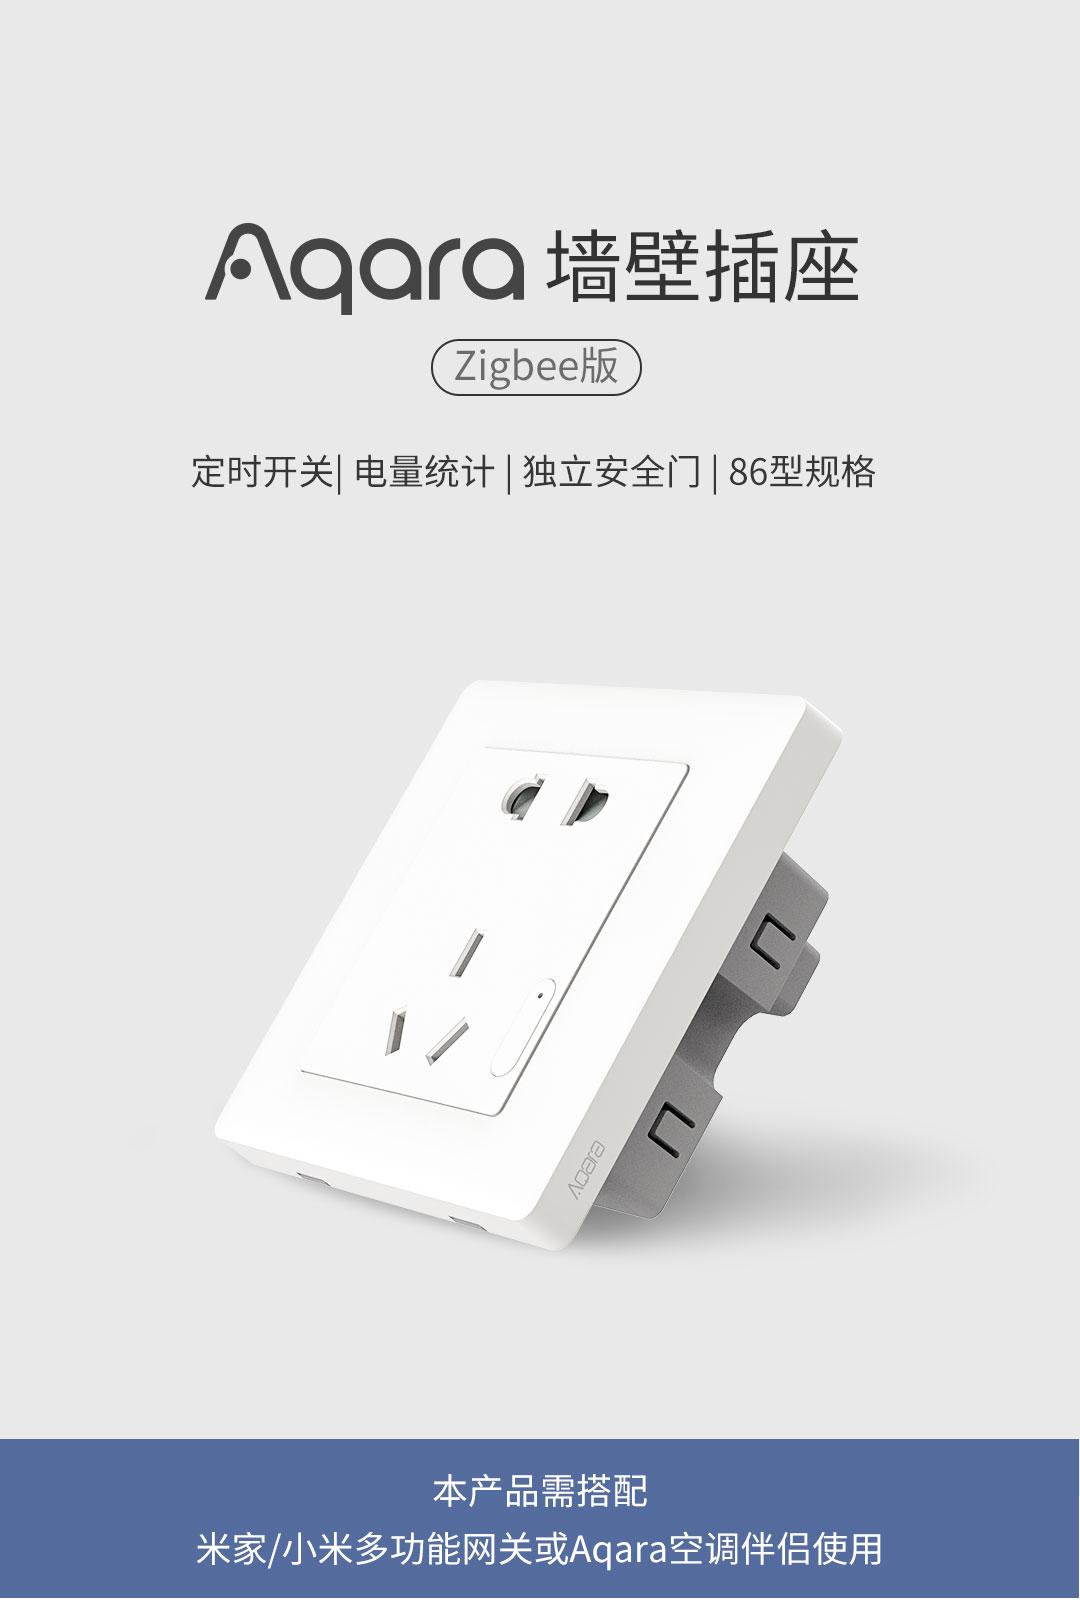 aqara 智能墙壁插座 Zigbee版